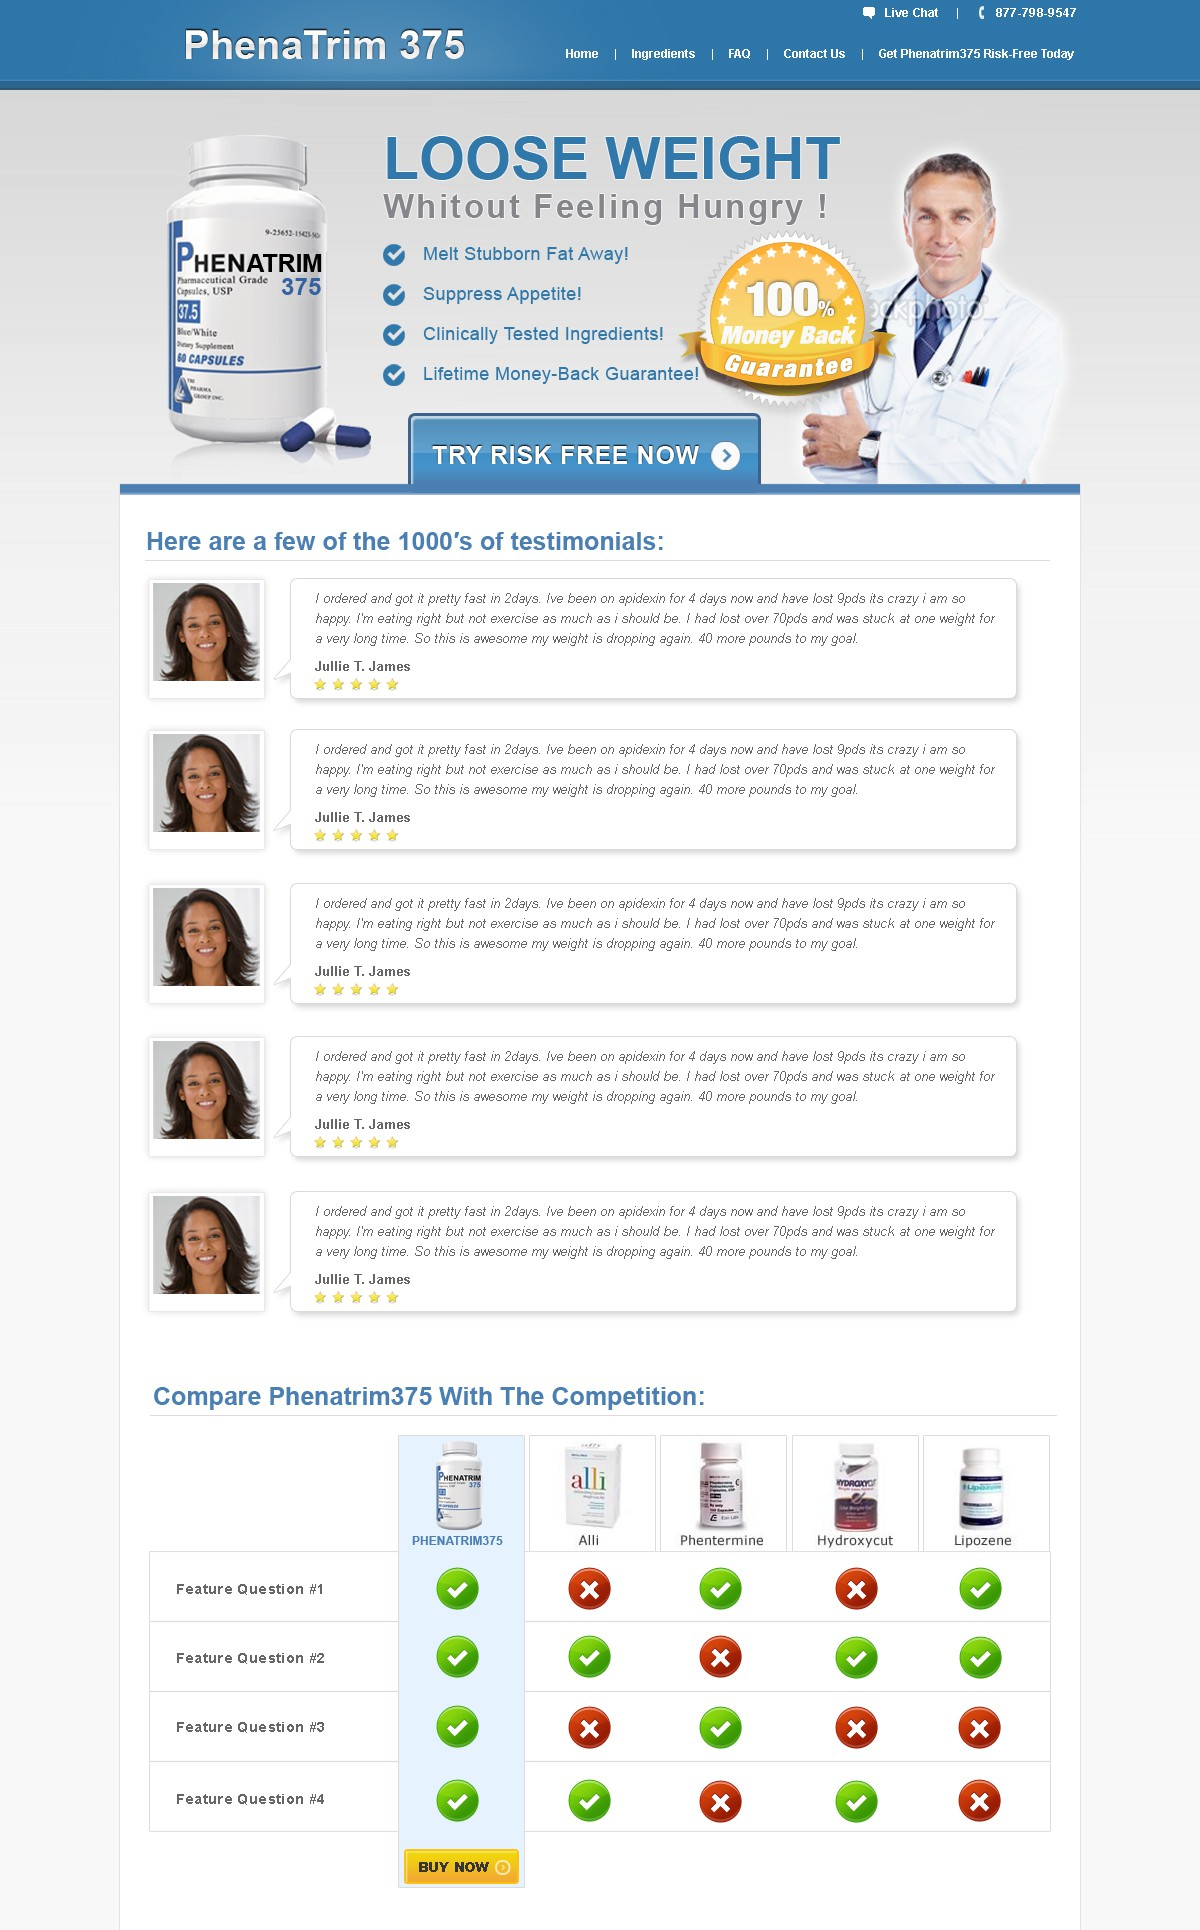 website design for PhenaTrim375